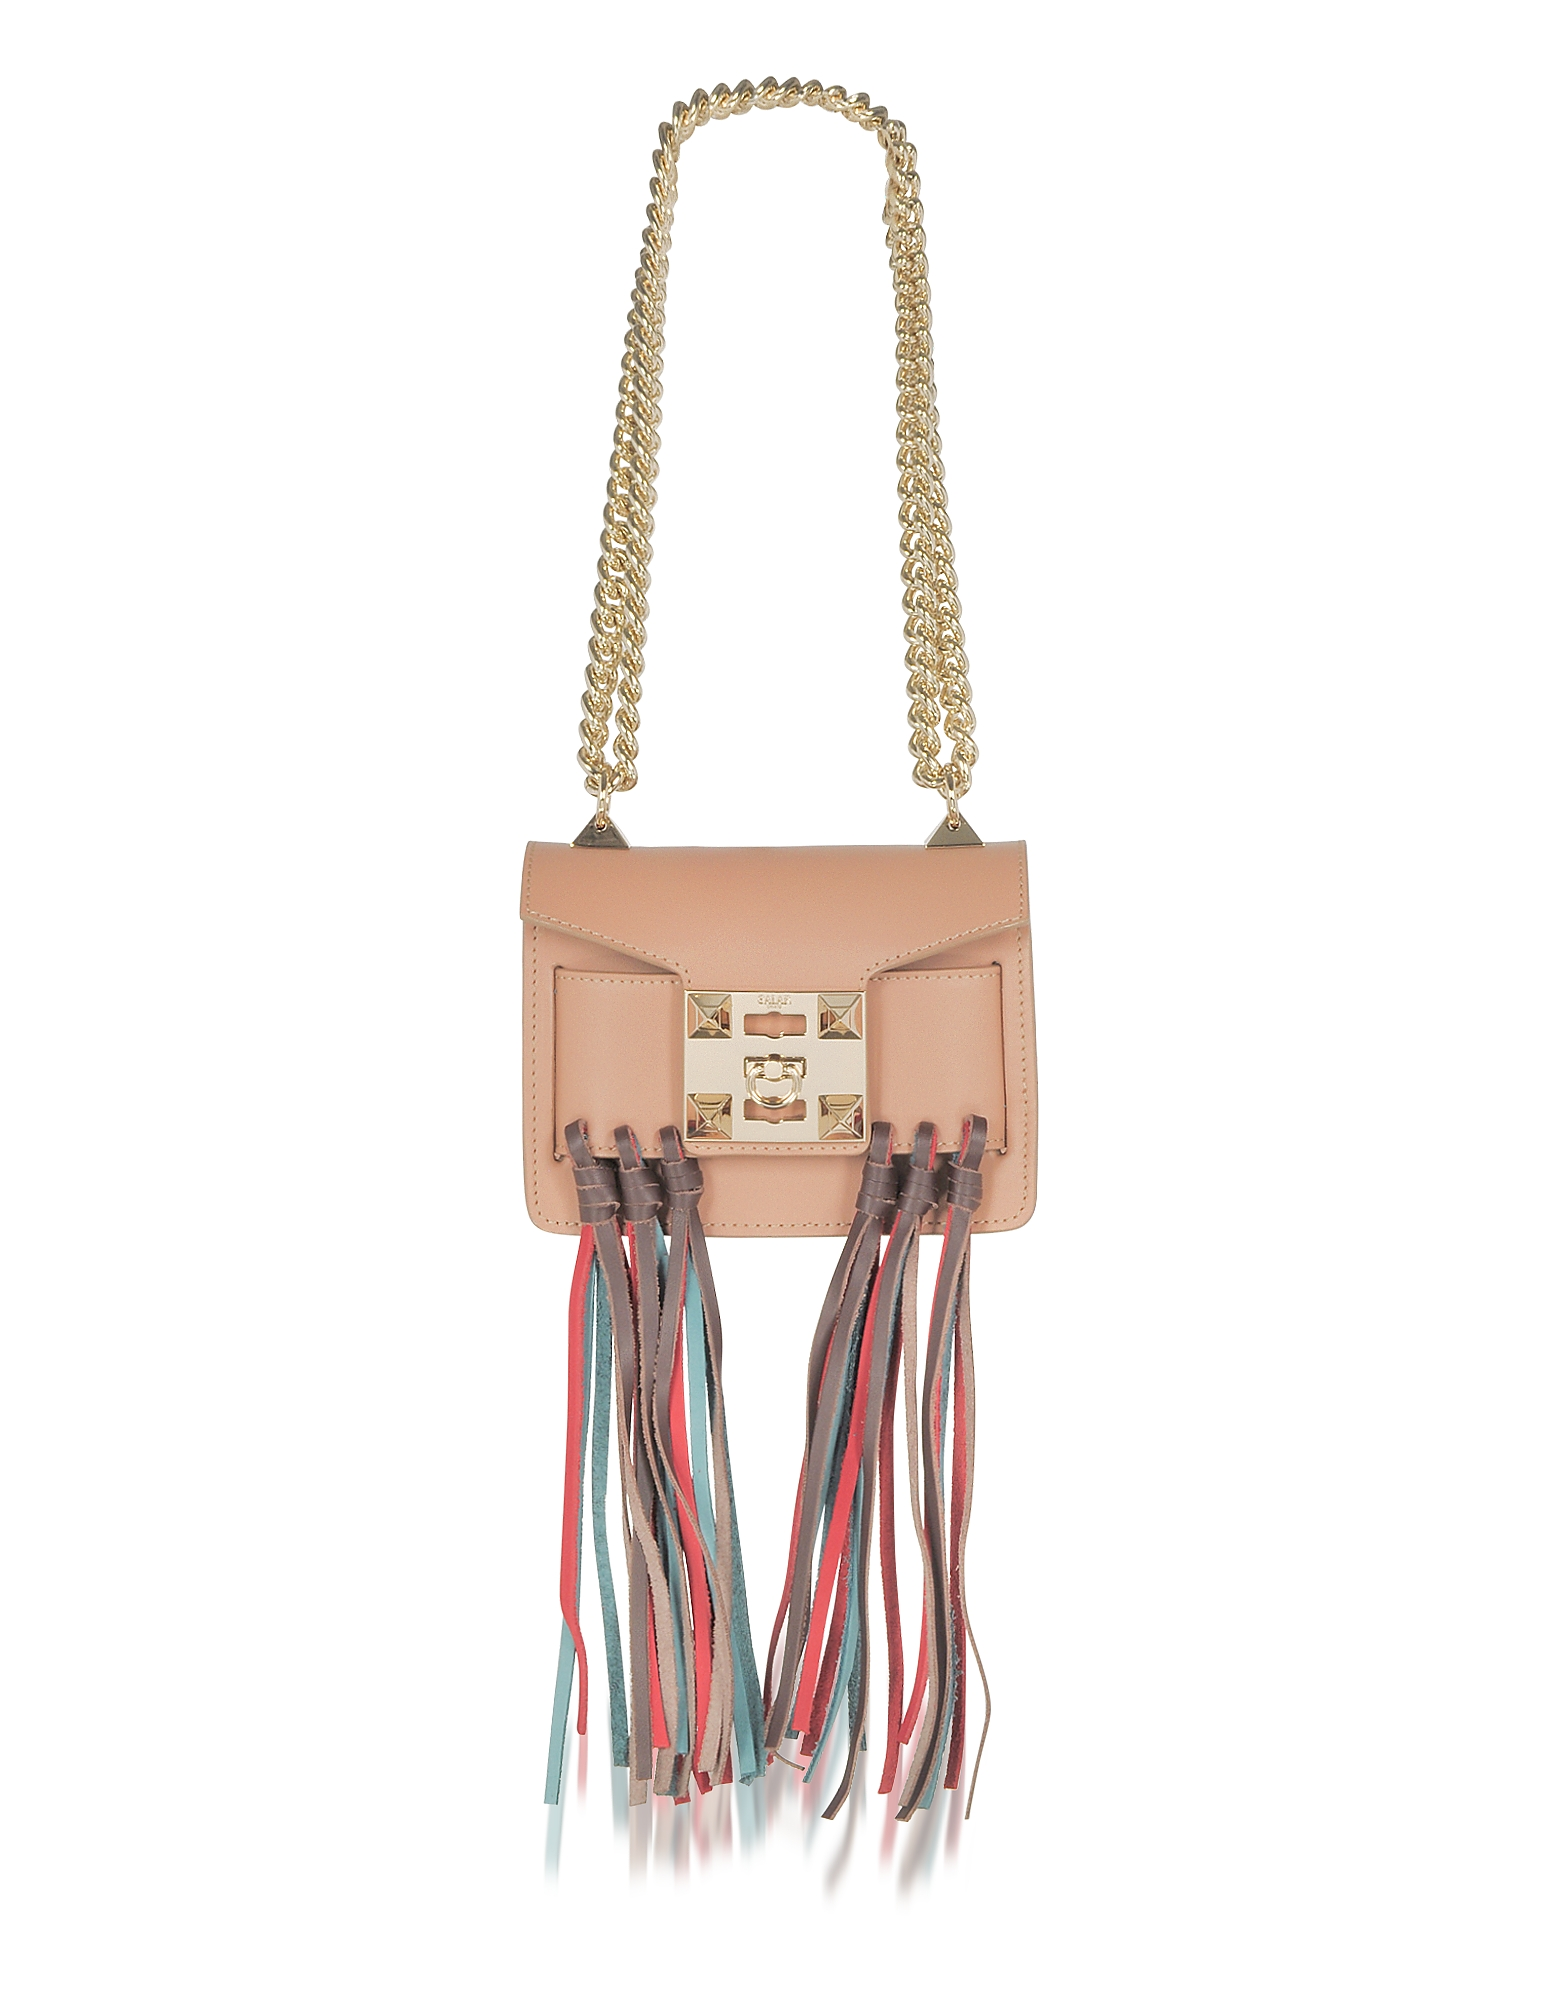 Salar Handbags, Gaia Rainbow Cognac Leather Shoulder Bag w/Fringes